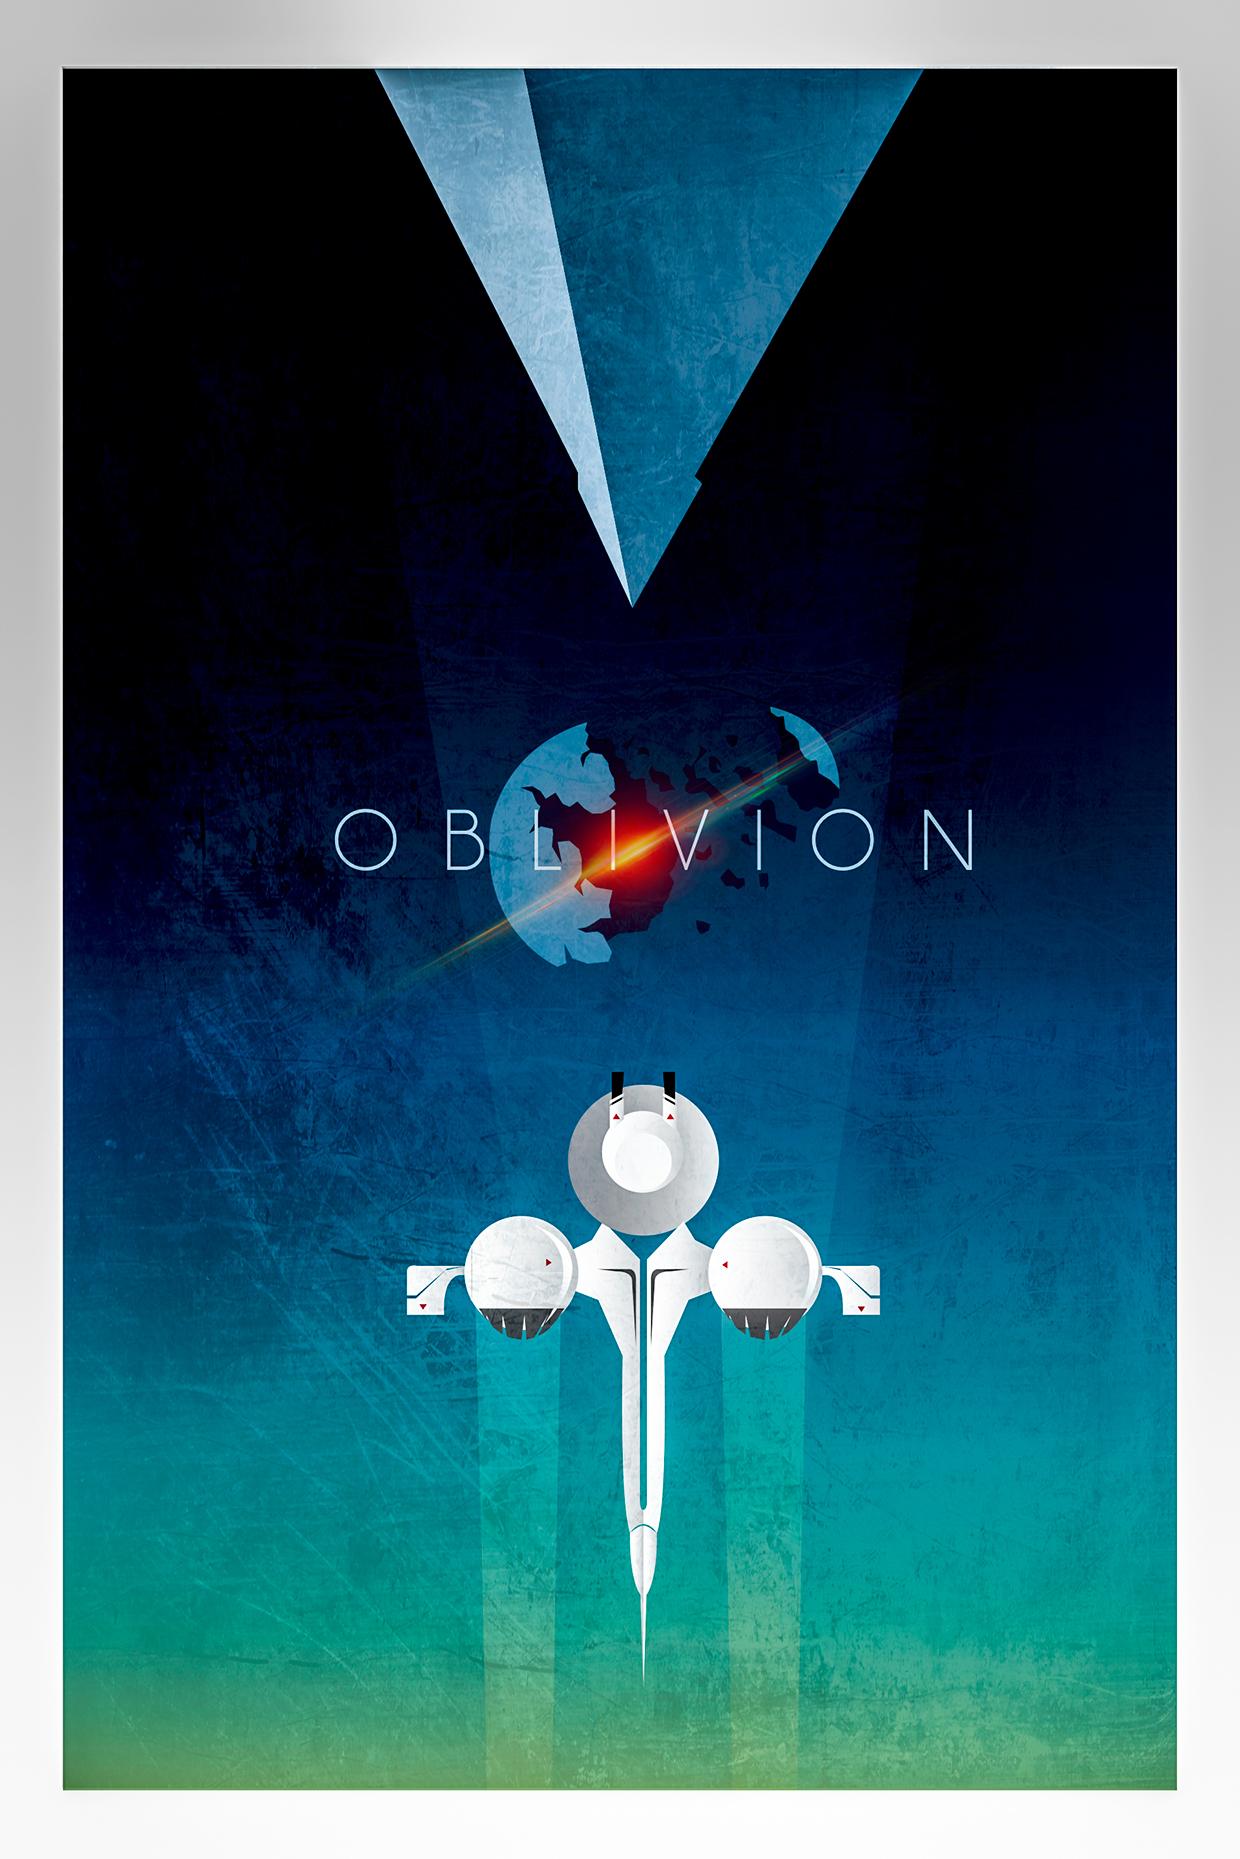 Oblivion Poster by Luigi Rinaldi